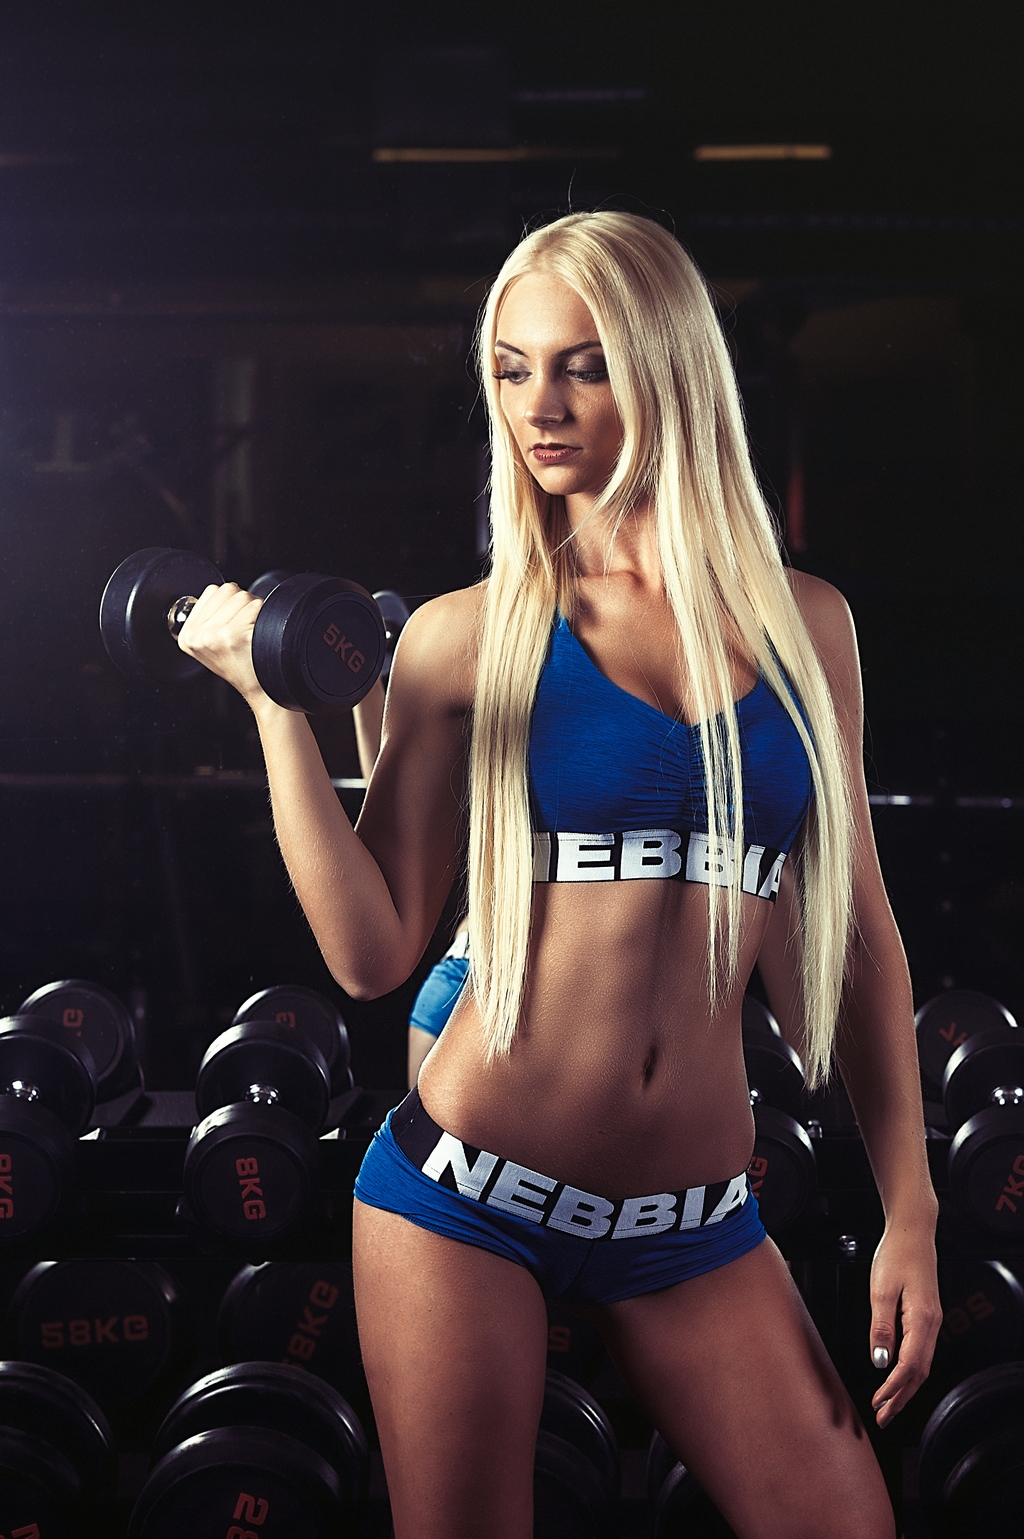 001_PhotoN_Fitness_web